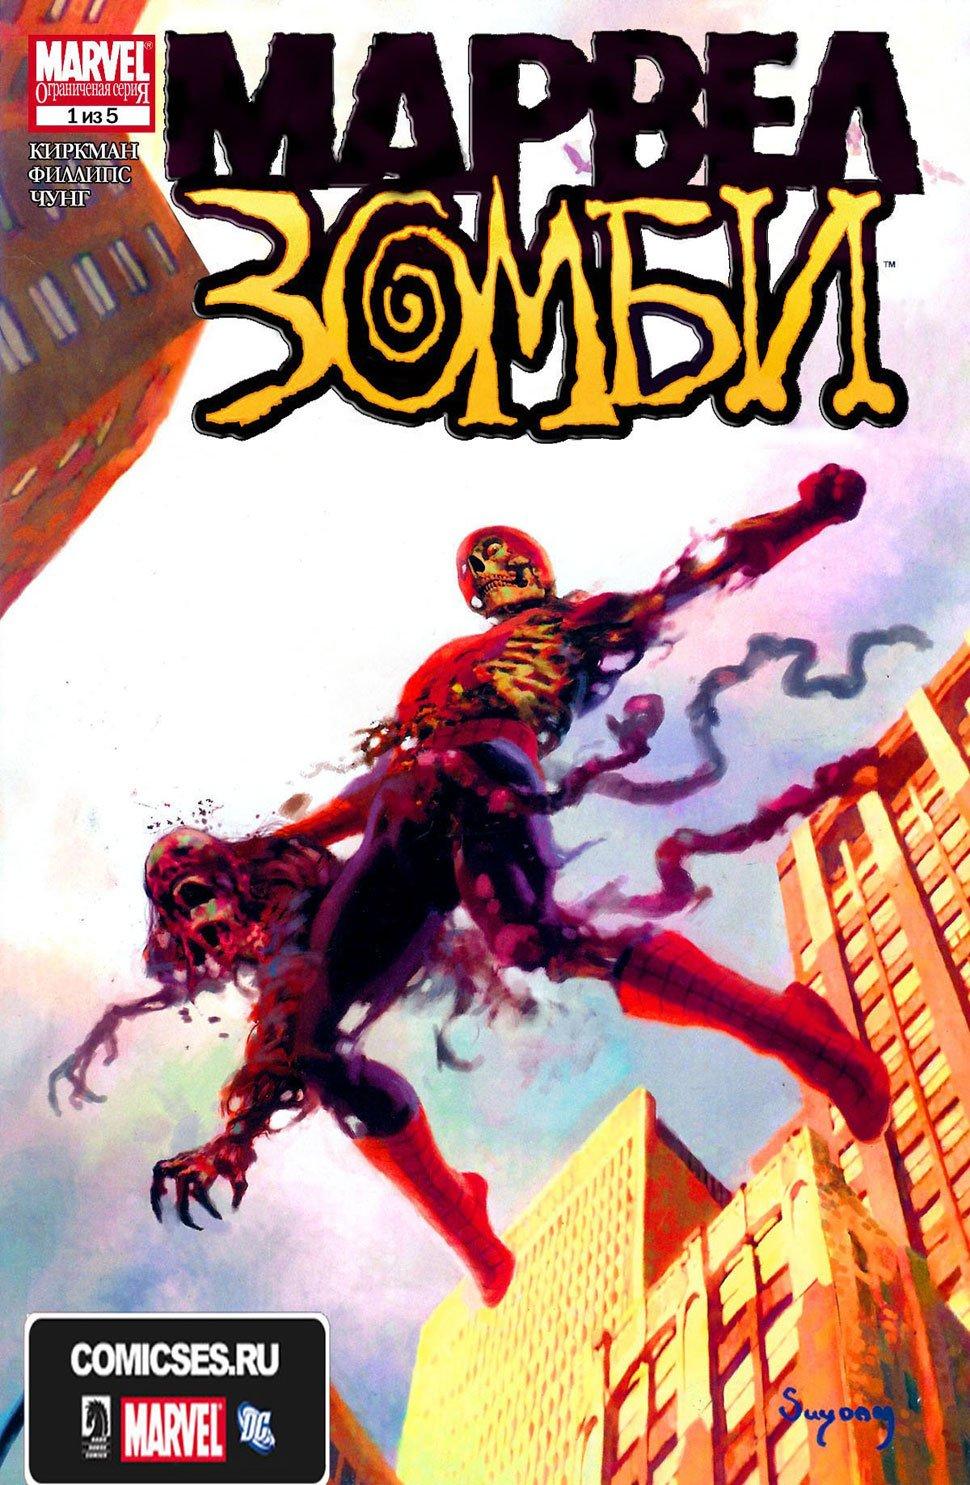 Комиксы марвел зомби на русском